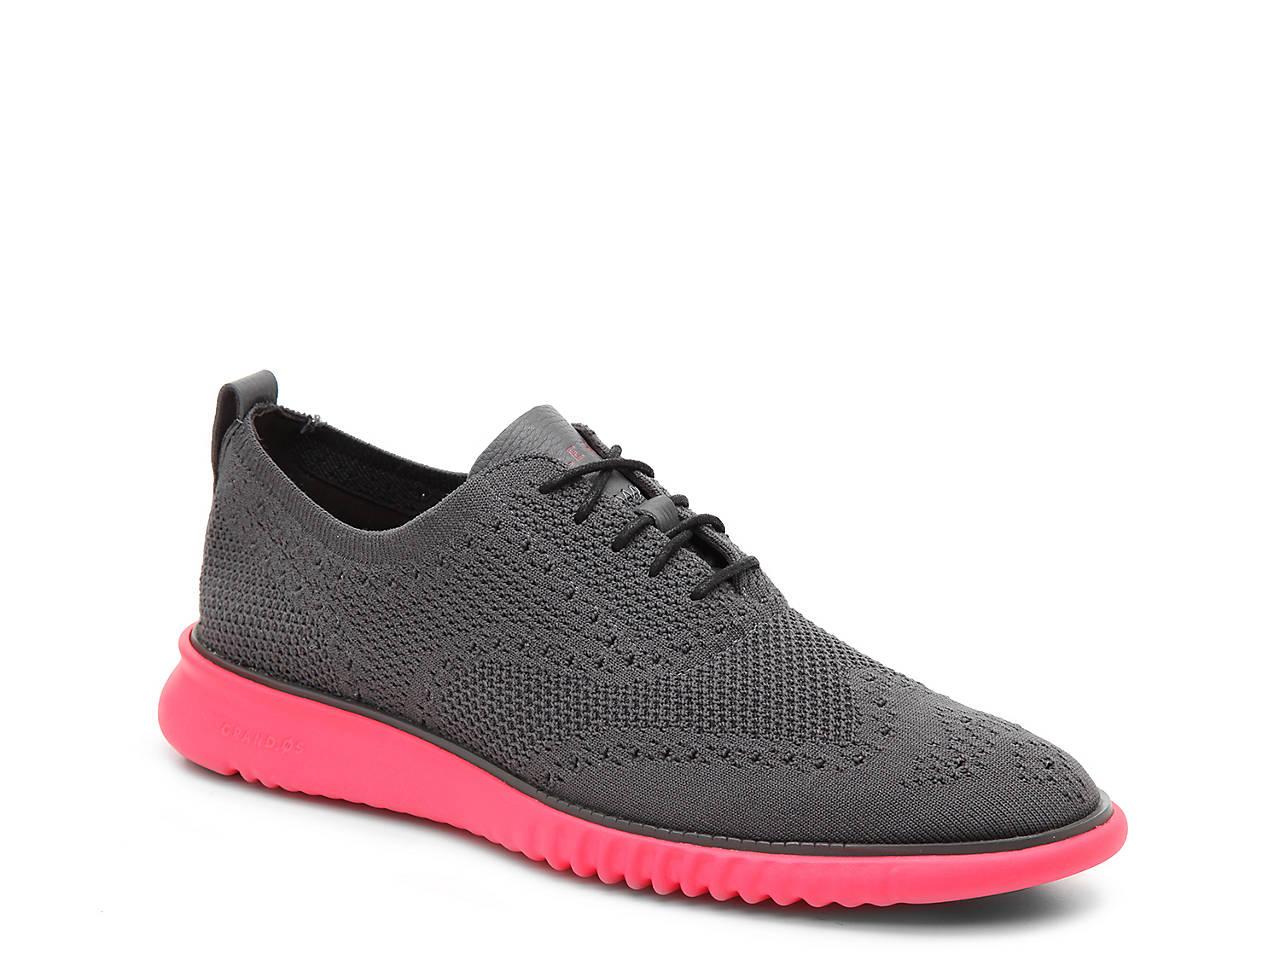 9cf74483da4 Cole Haan Zerogrand Stitchlite Wingtip Oxford Men s Shoes